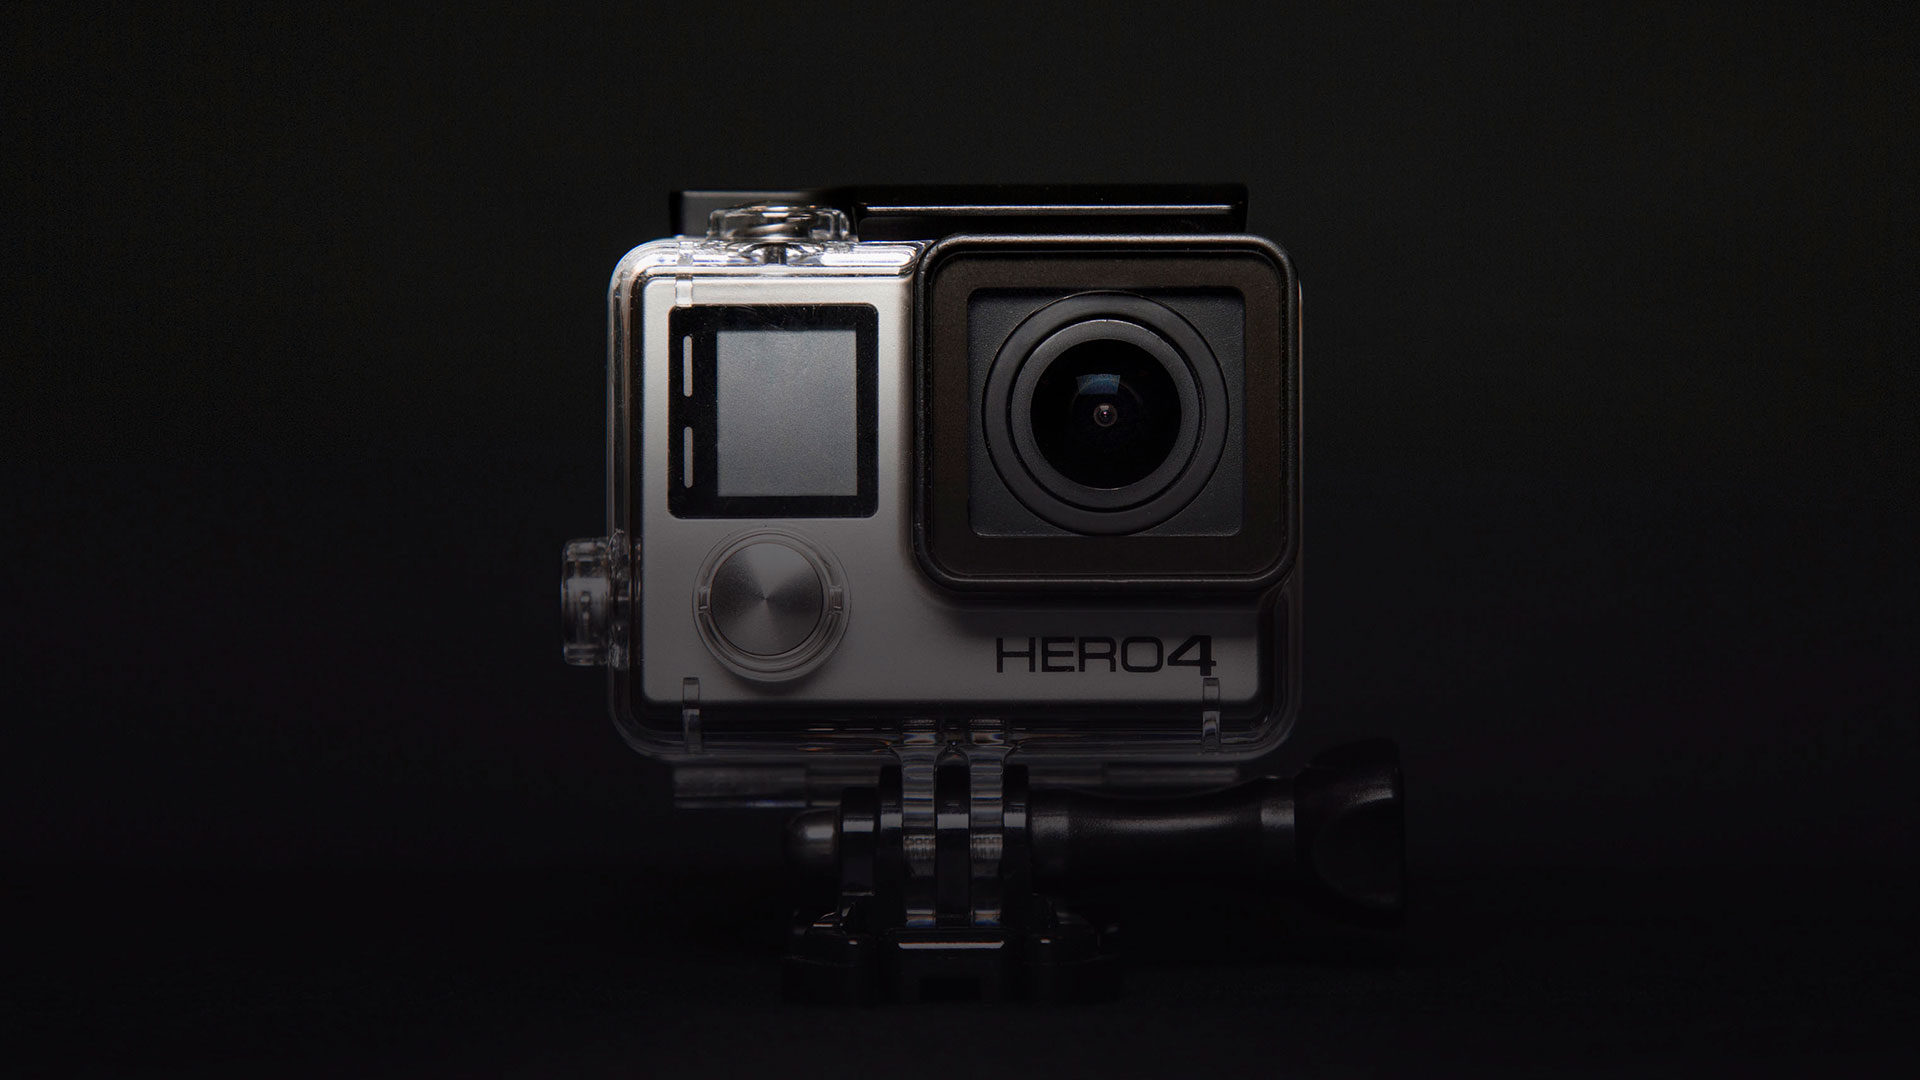 GoPro camera on black background